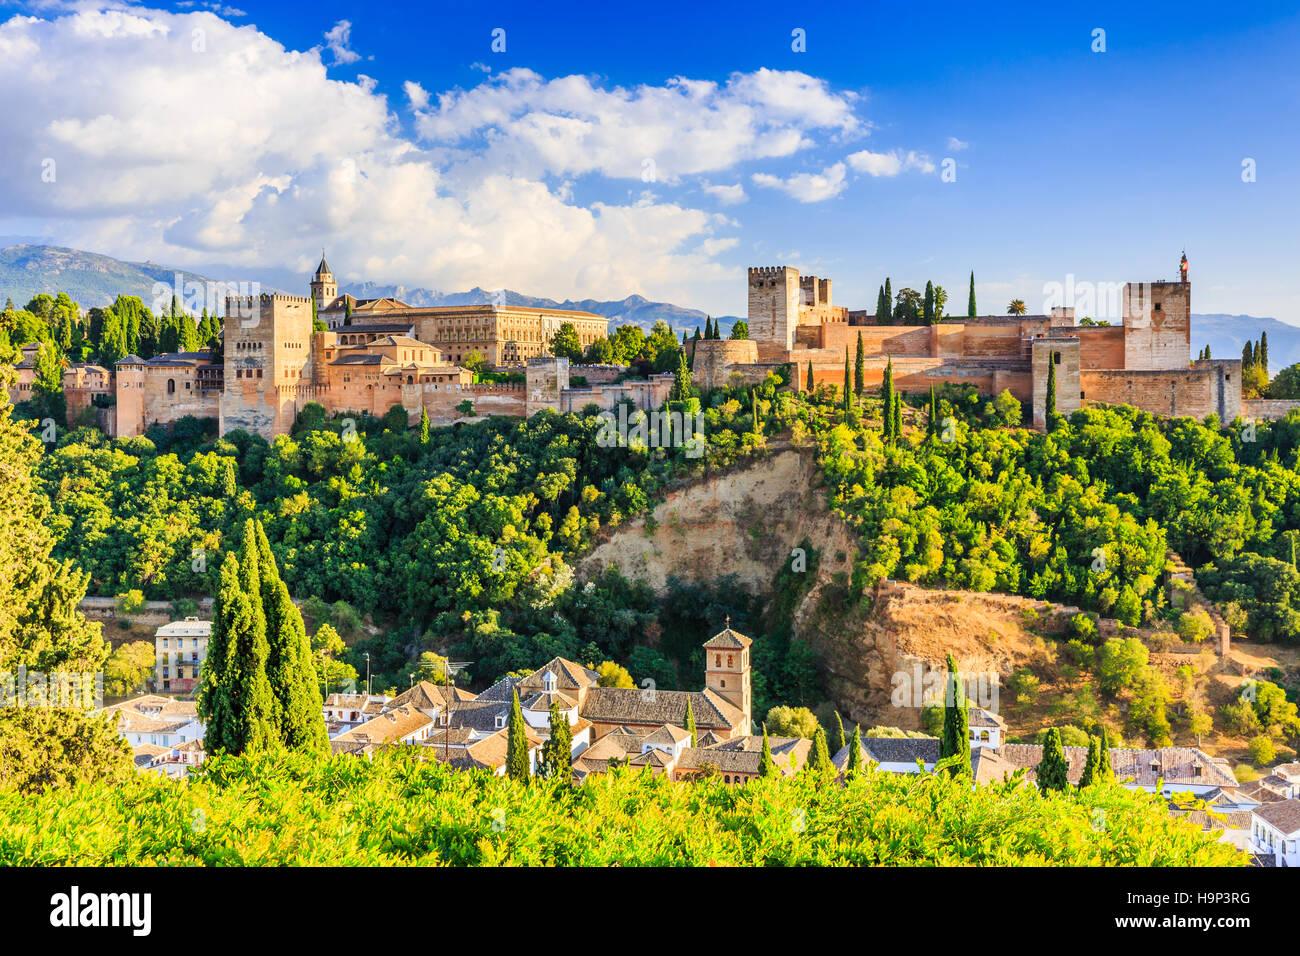 Alhambra de Granada, España. La fortaleza de la Alhambra. Imagen De Stock